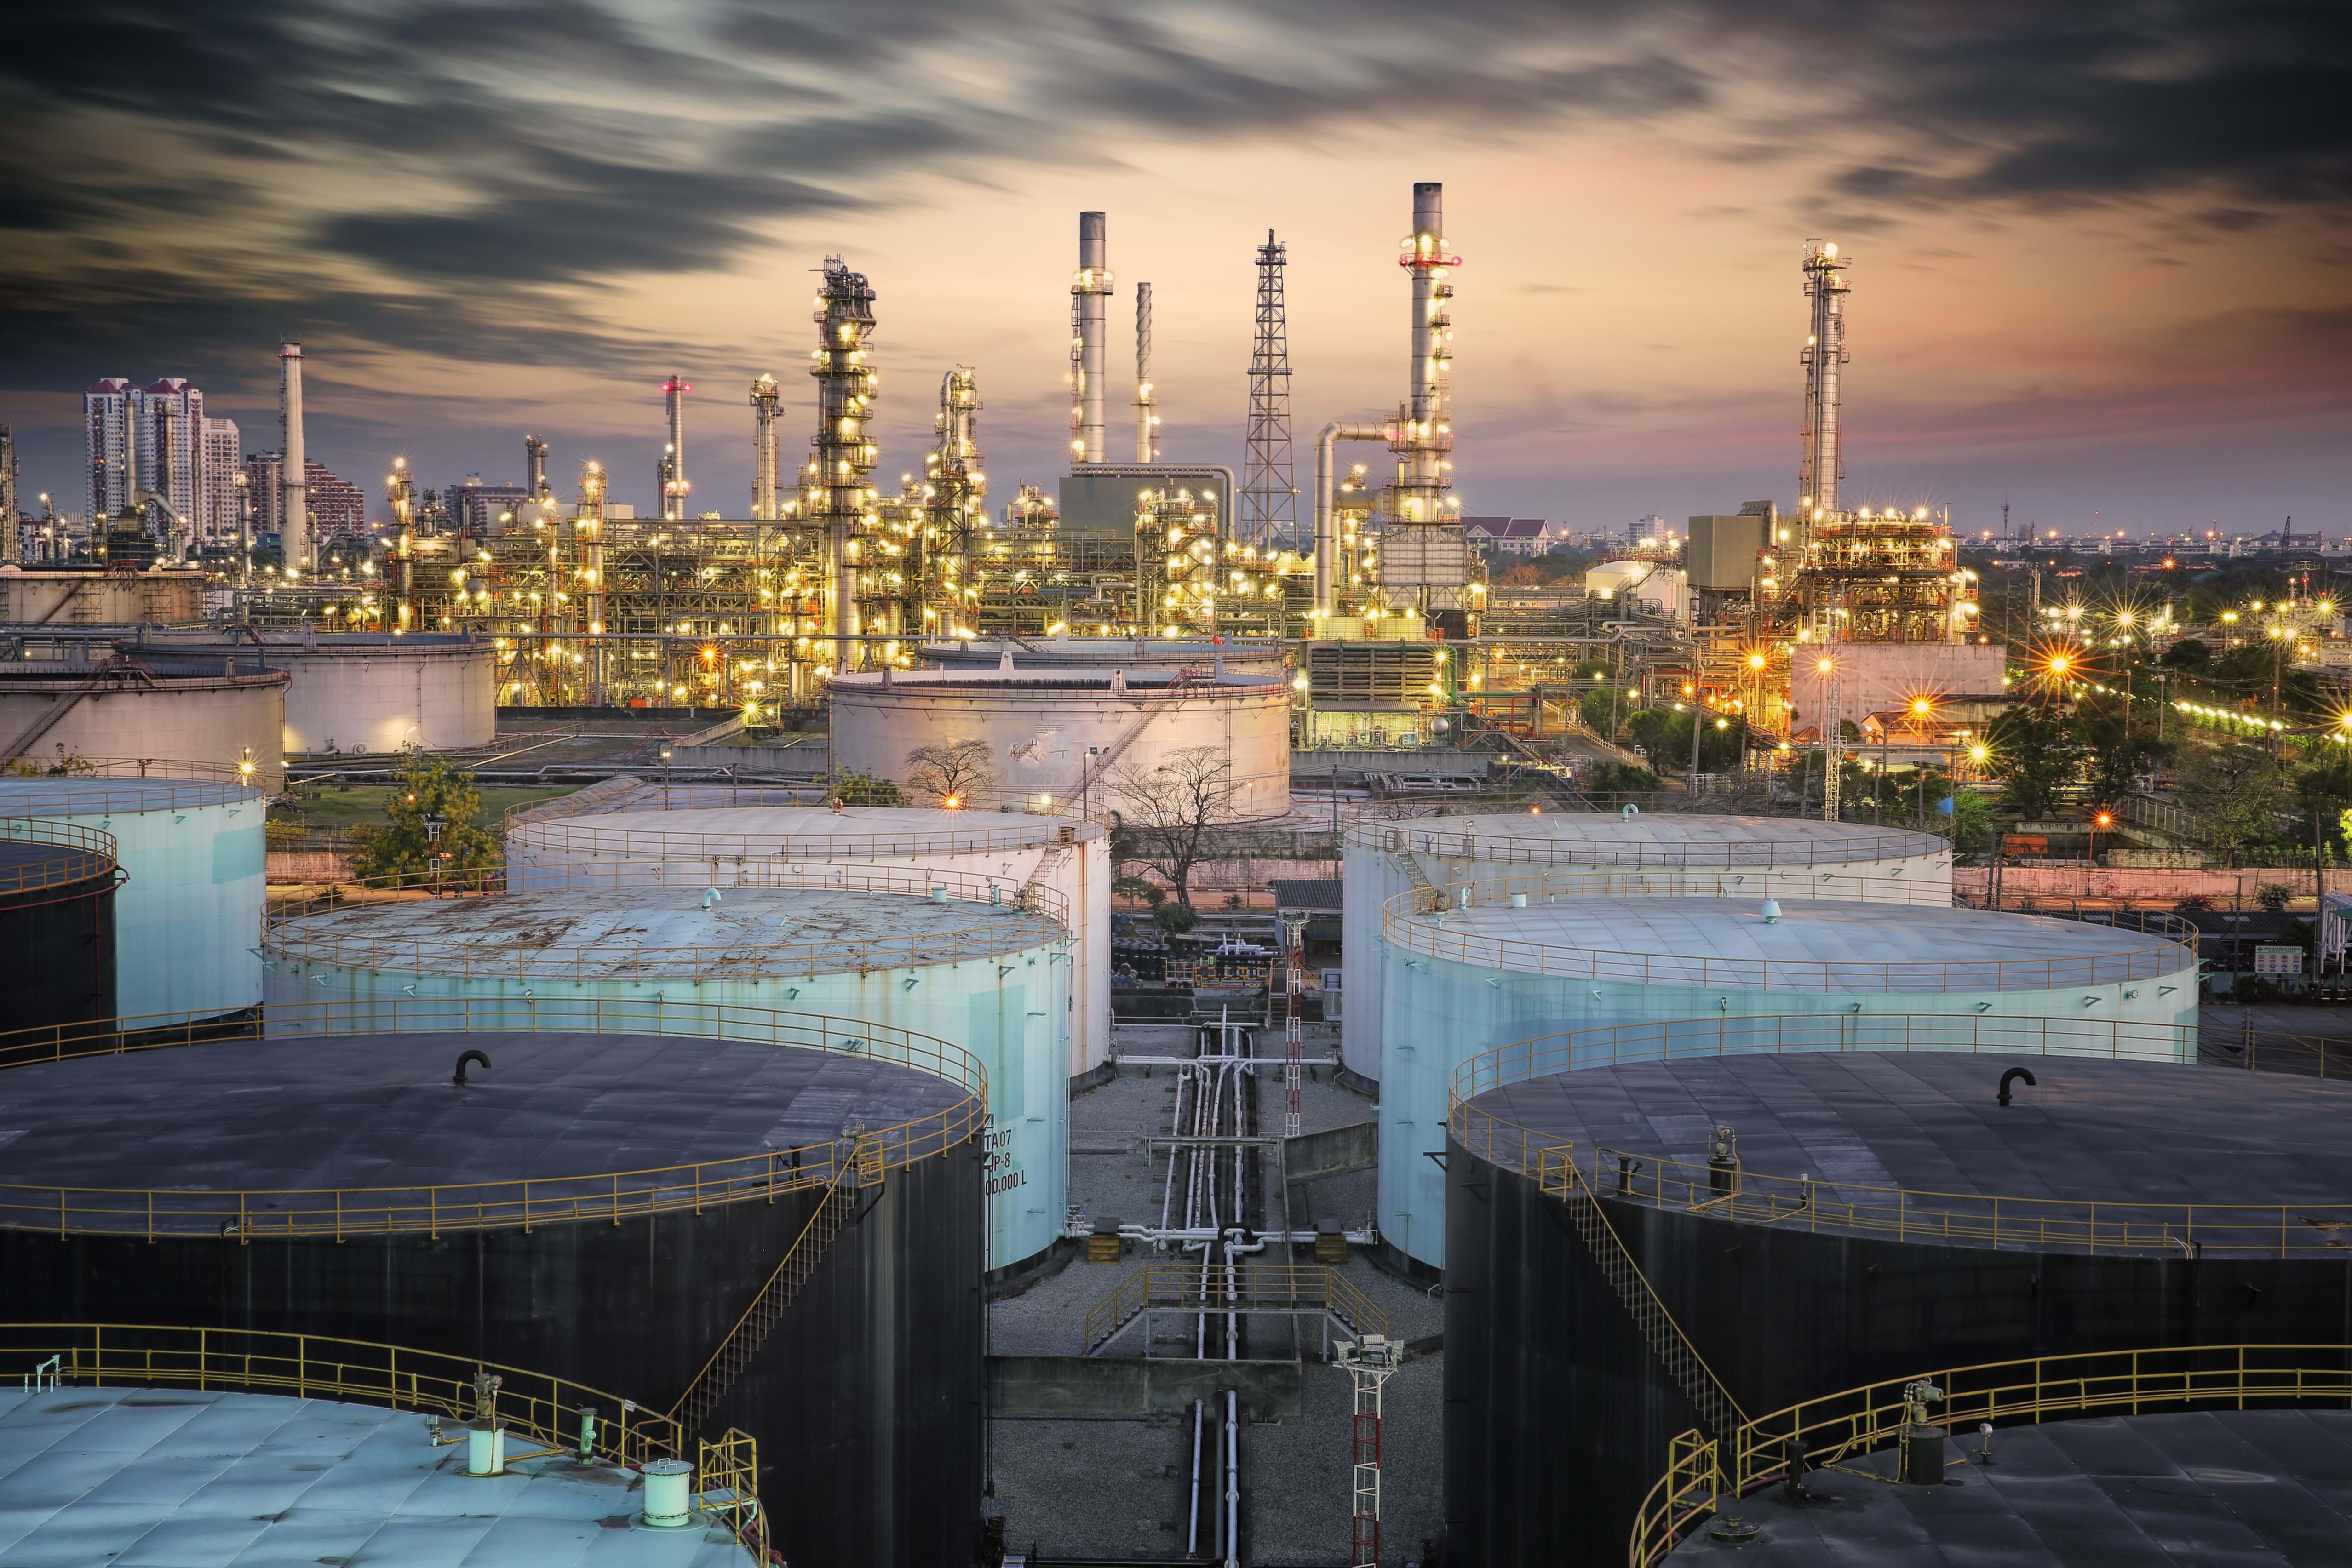 Refinery Industrial Load